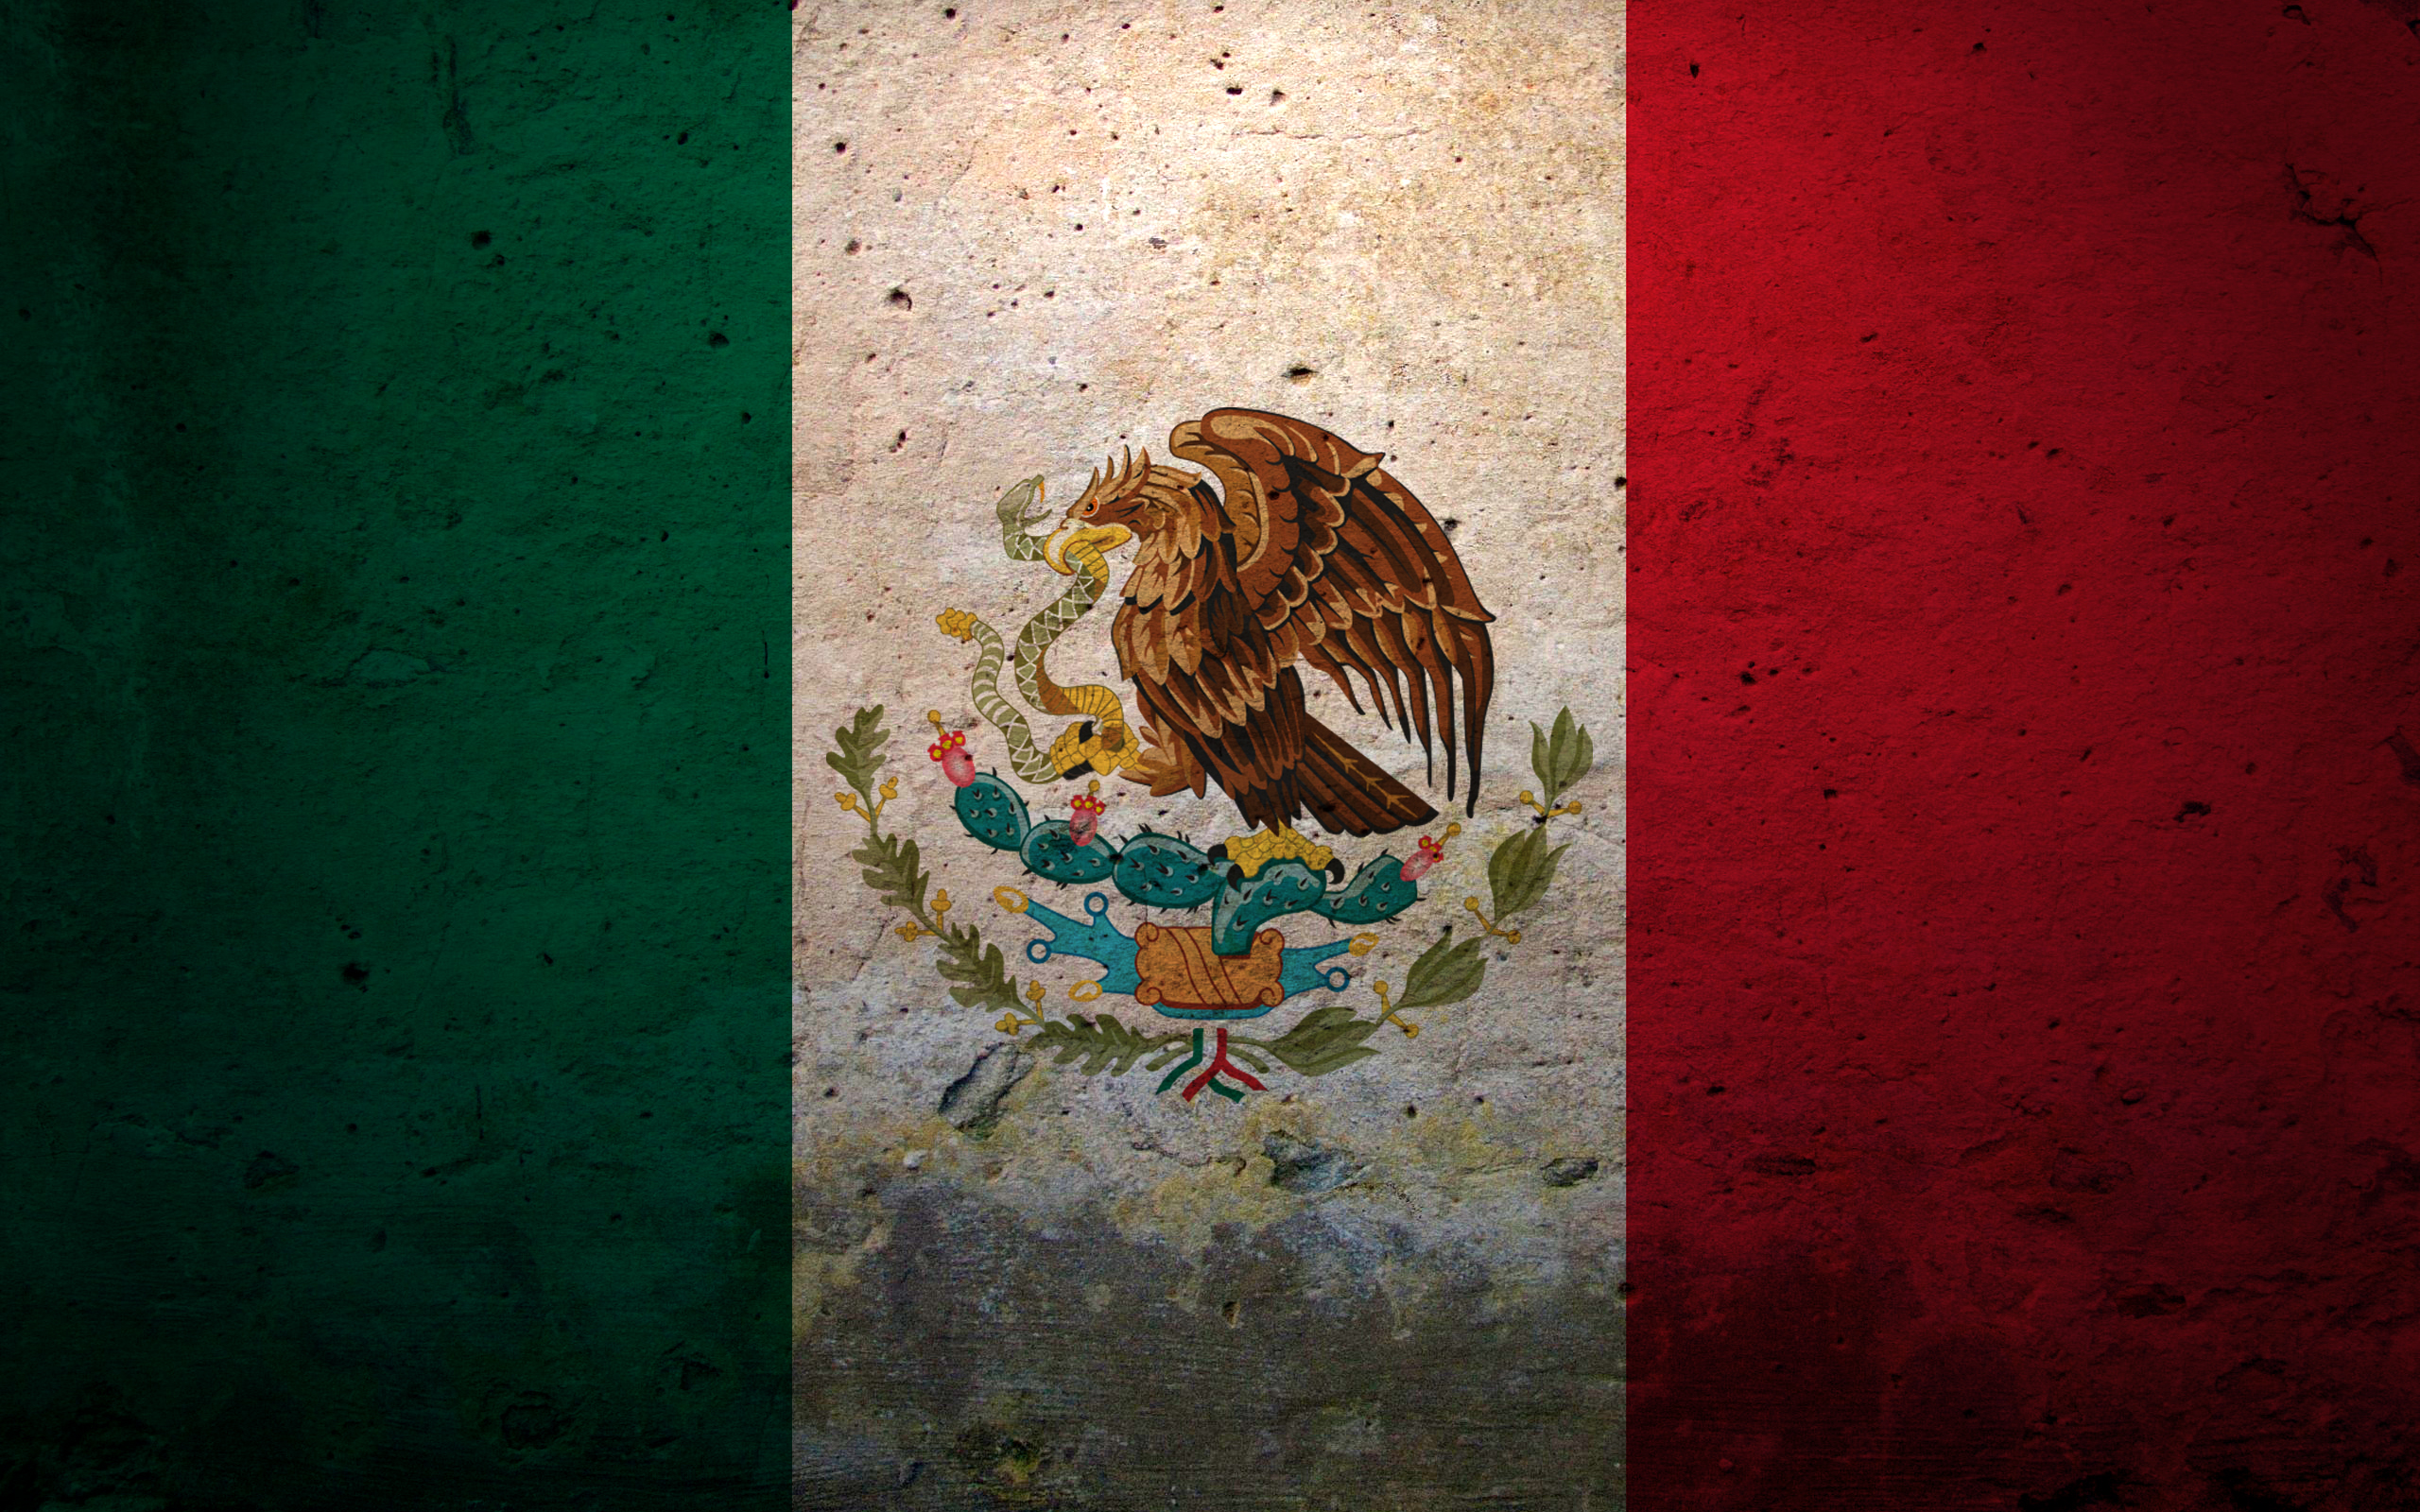 Flags Mexico Wallpaper 2560x1600 Flags Mexico 2560x1600